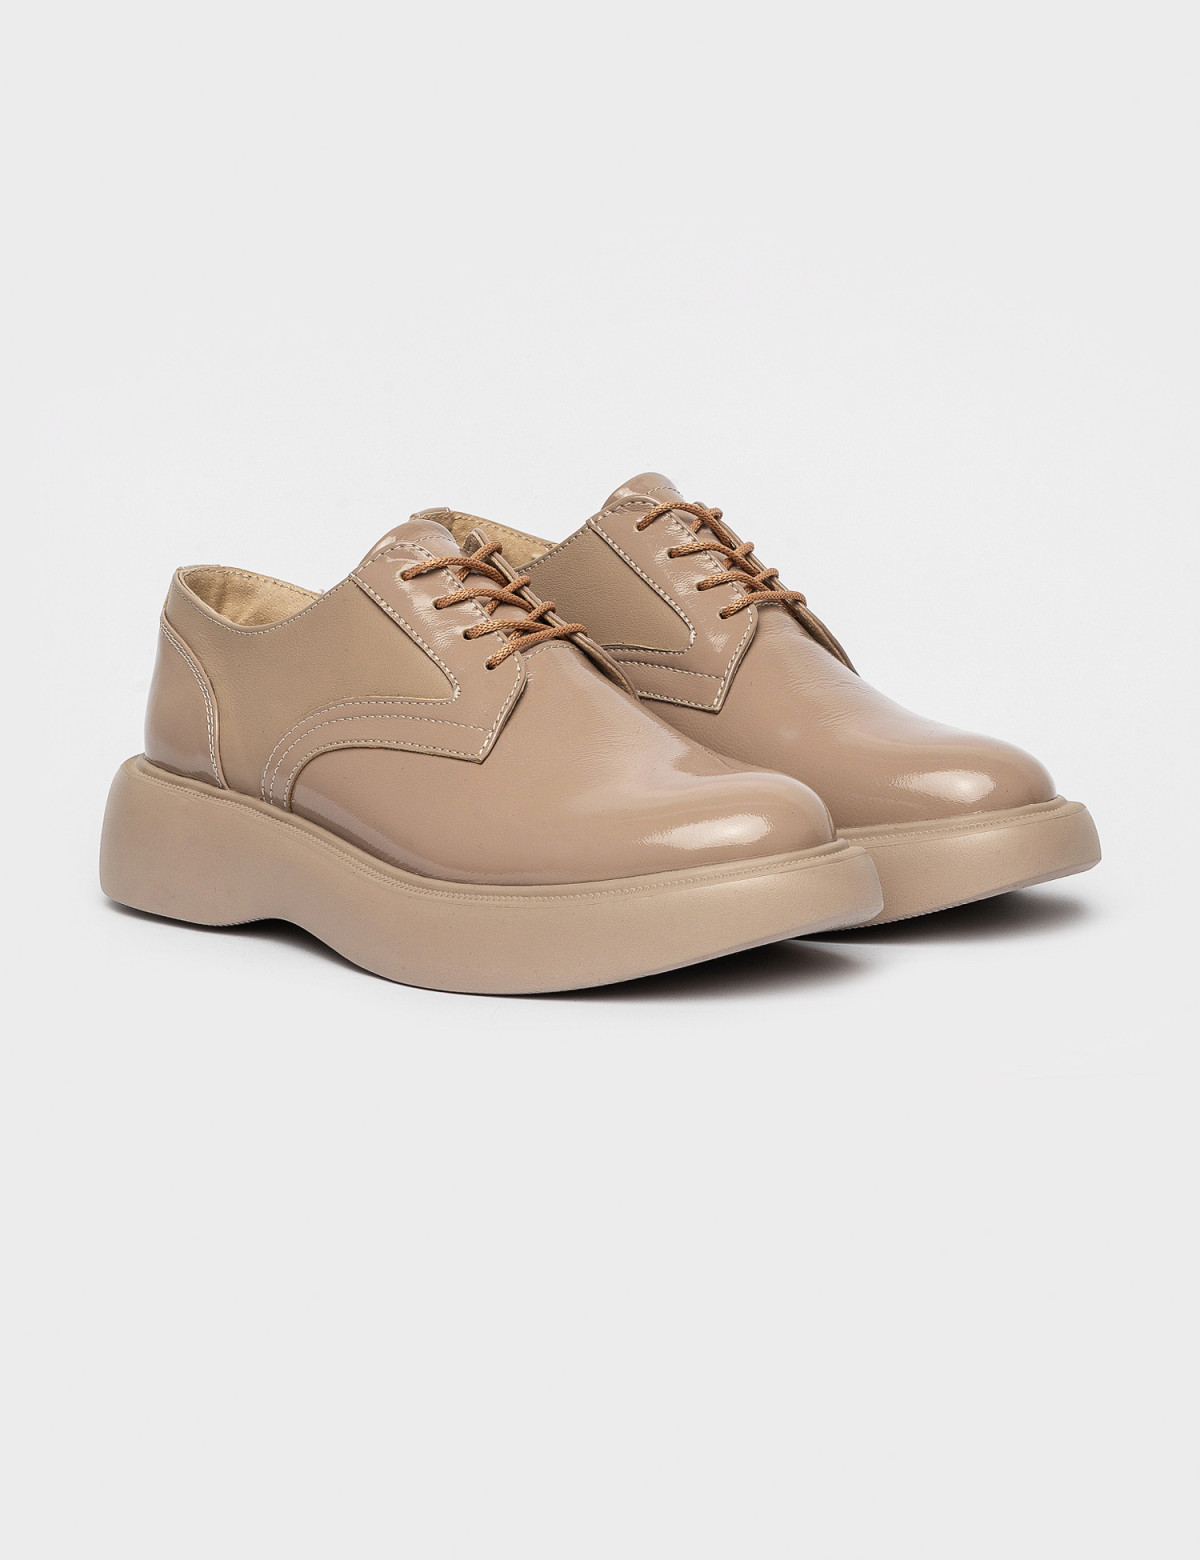 Туфлі бежеві. Натуральна шкіра1